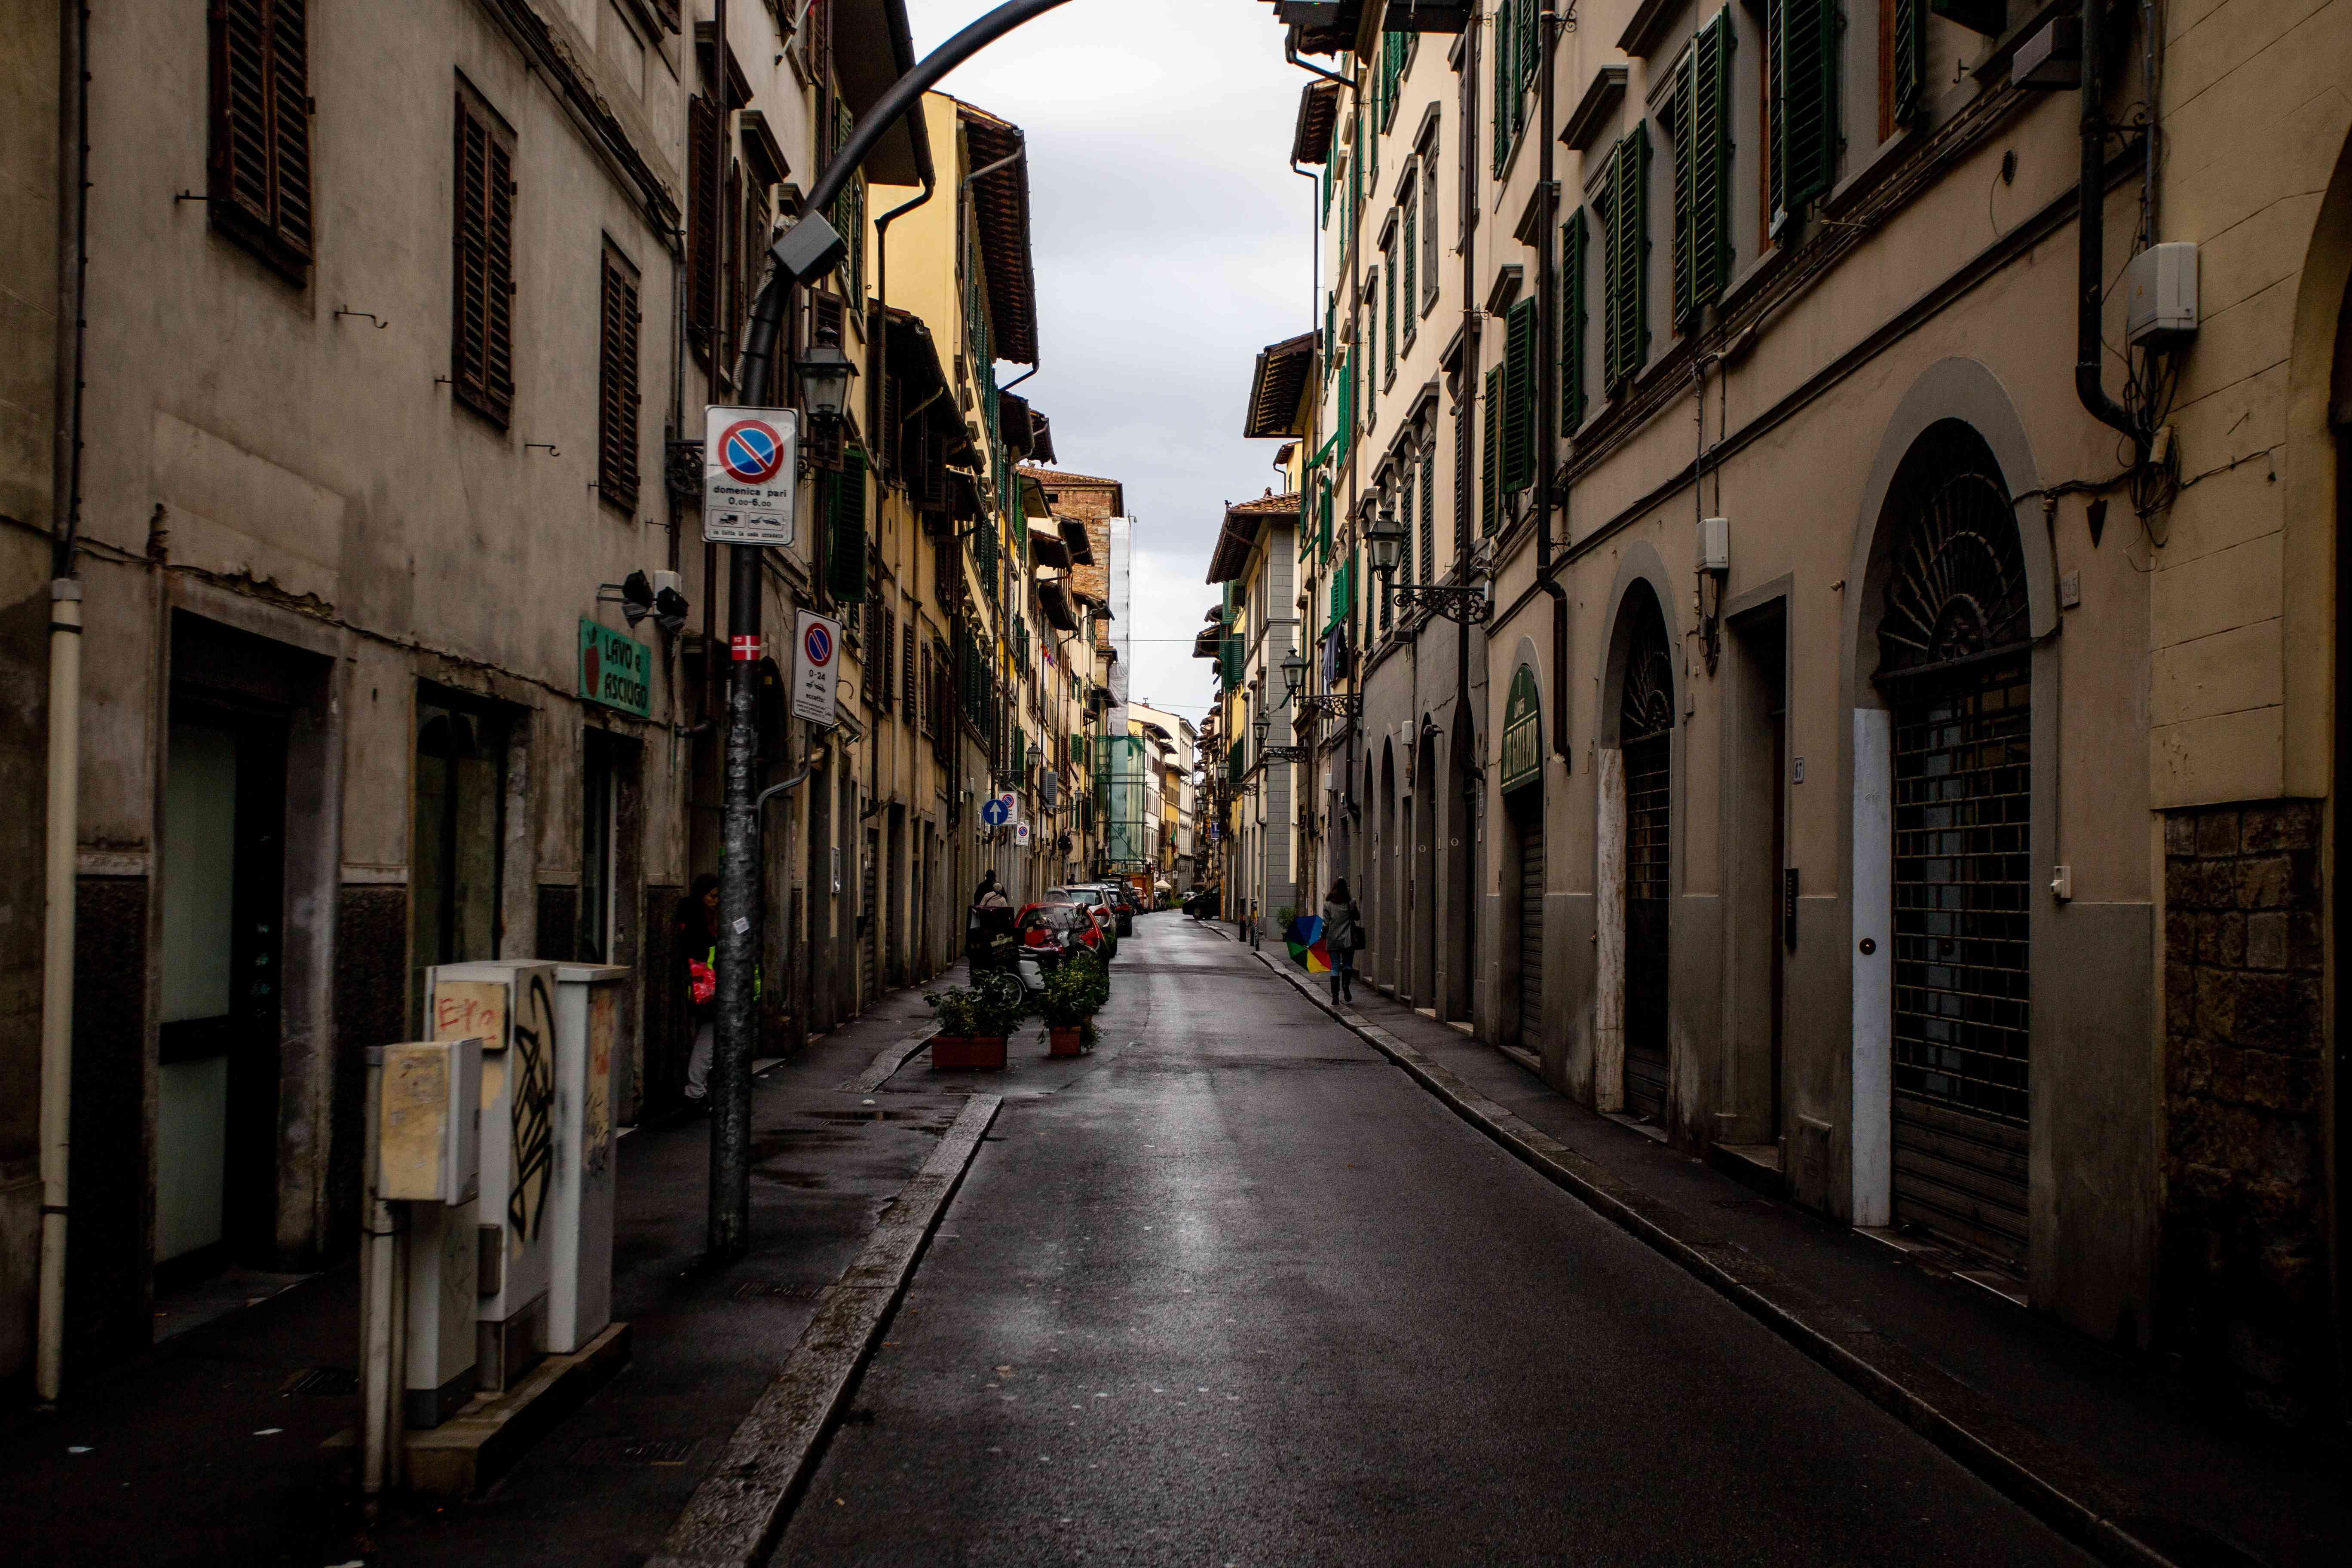 San Frediano neighborhood in Florence, Italy